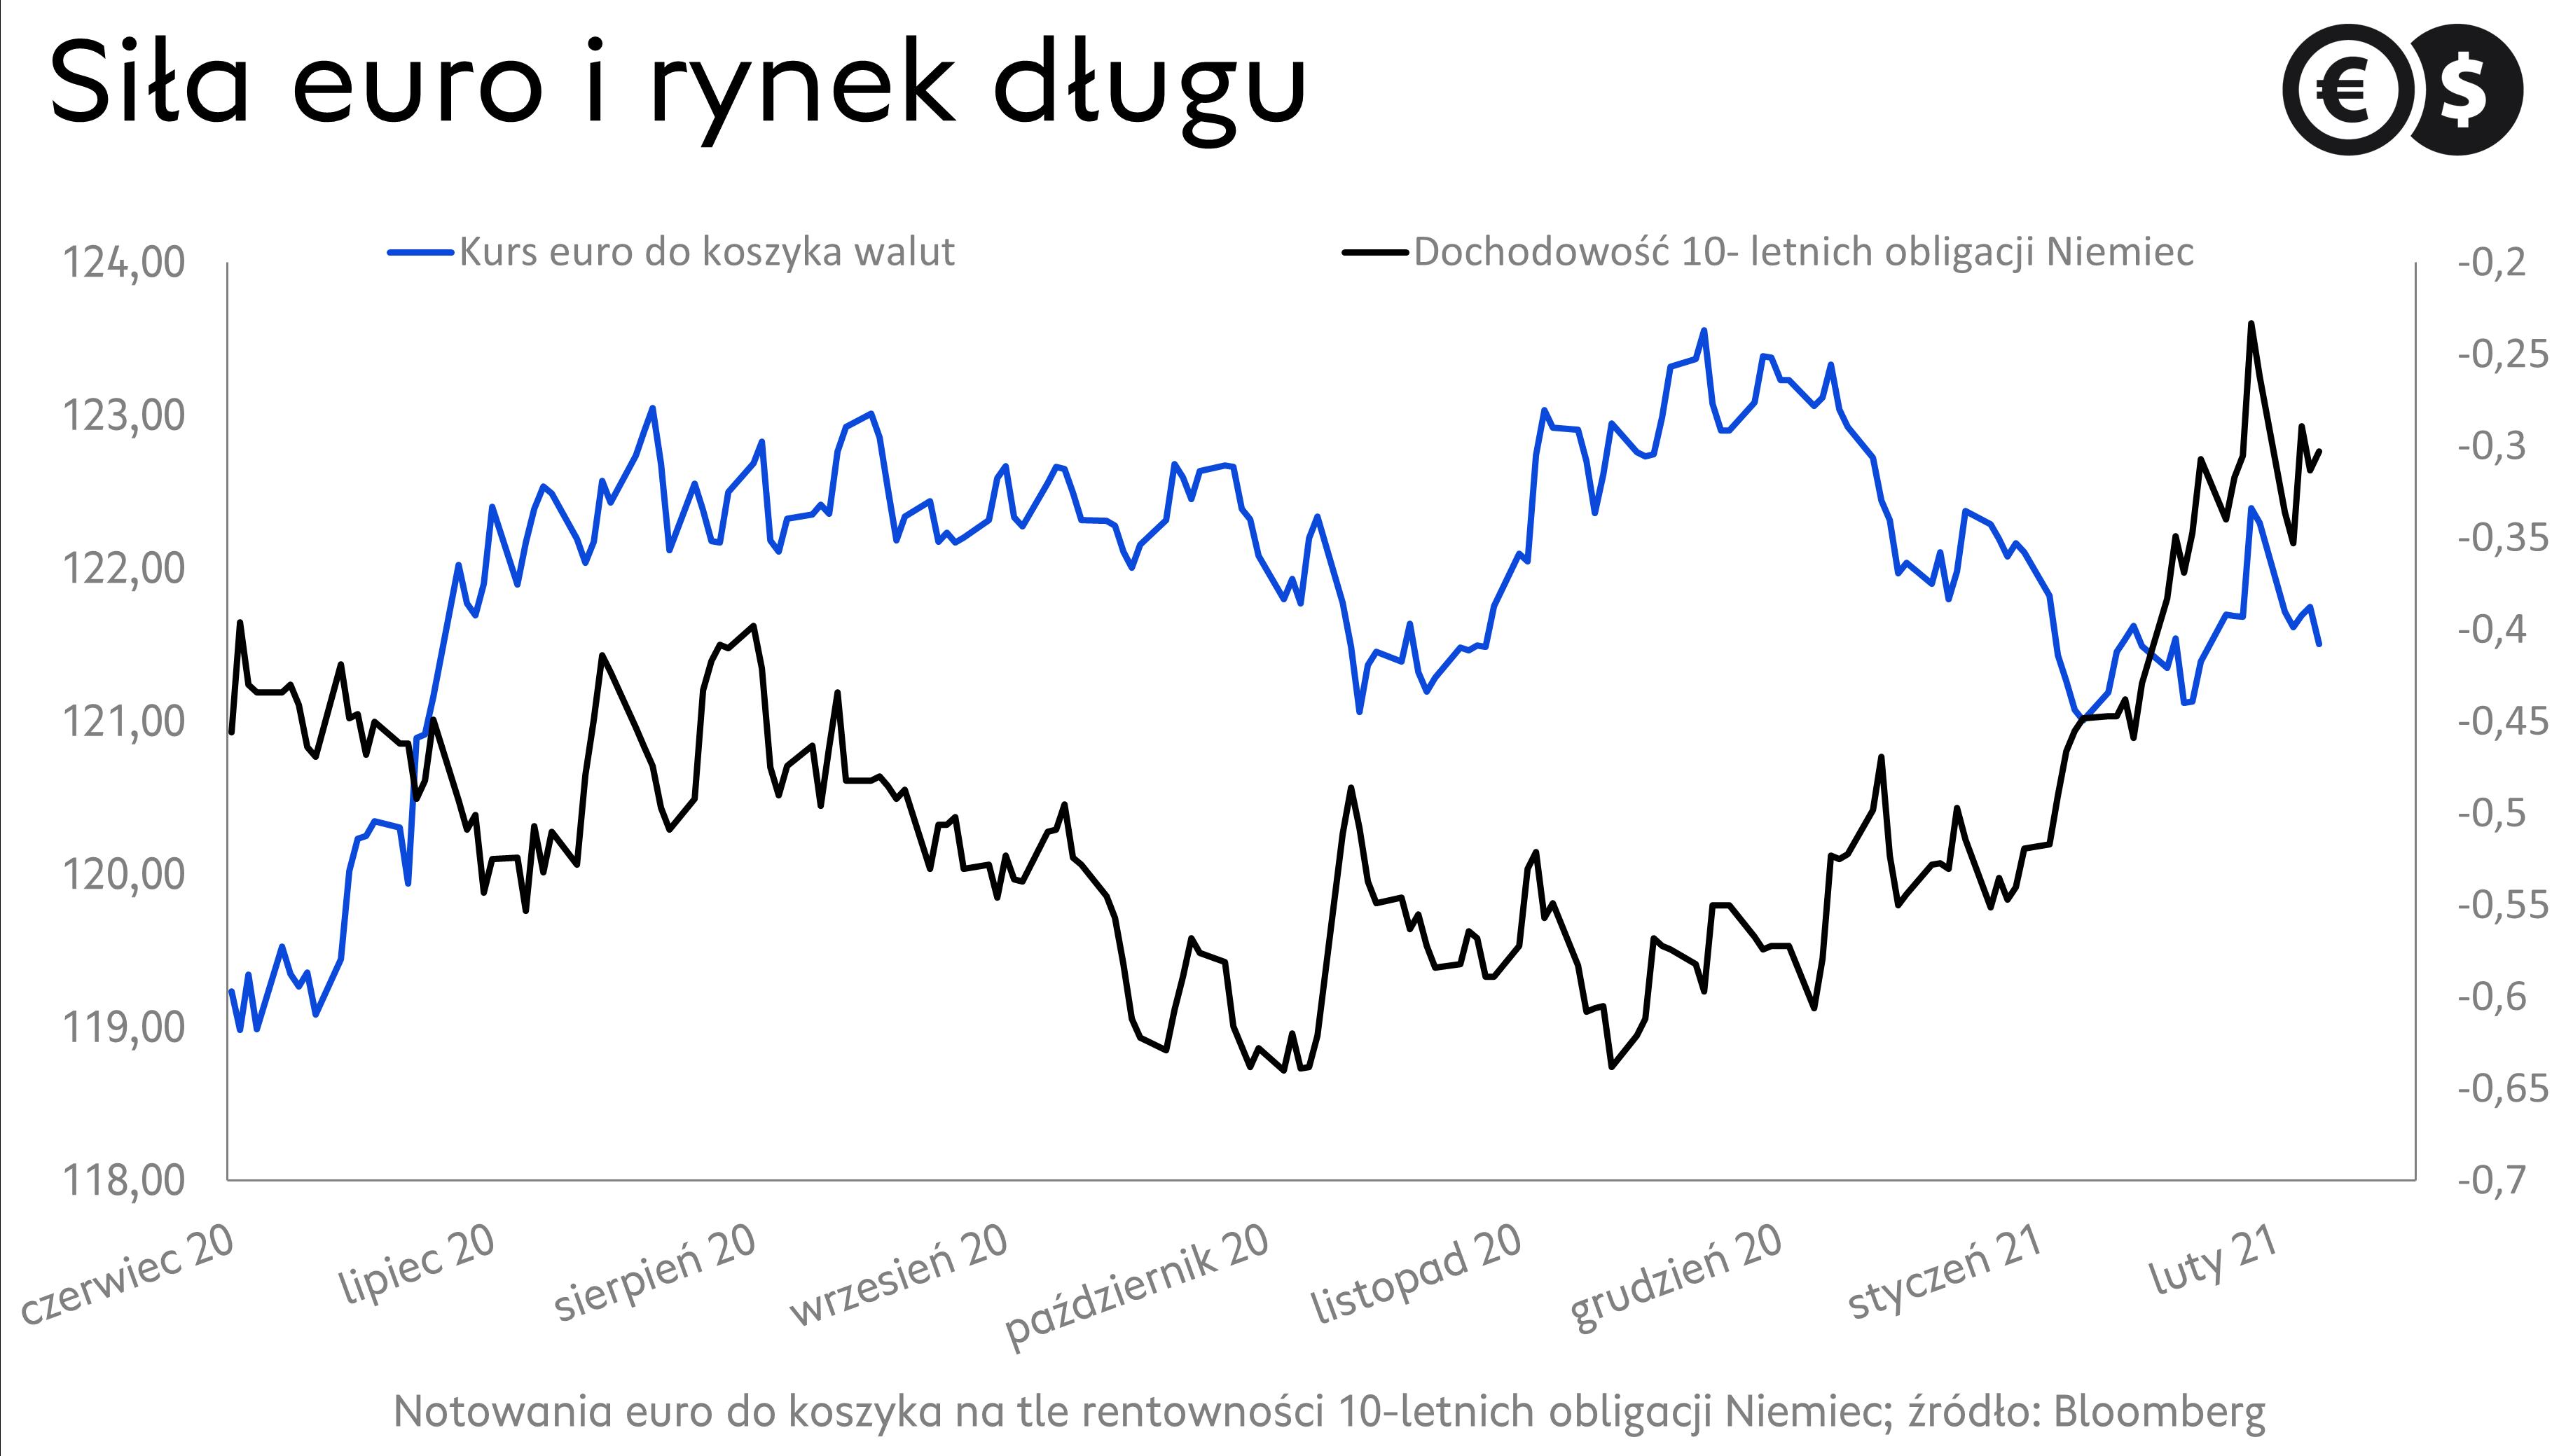 Euro i rynek długu